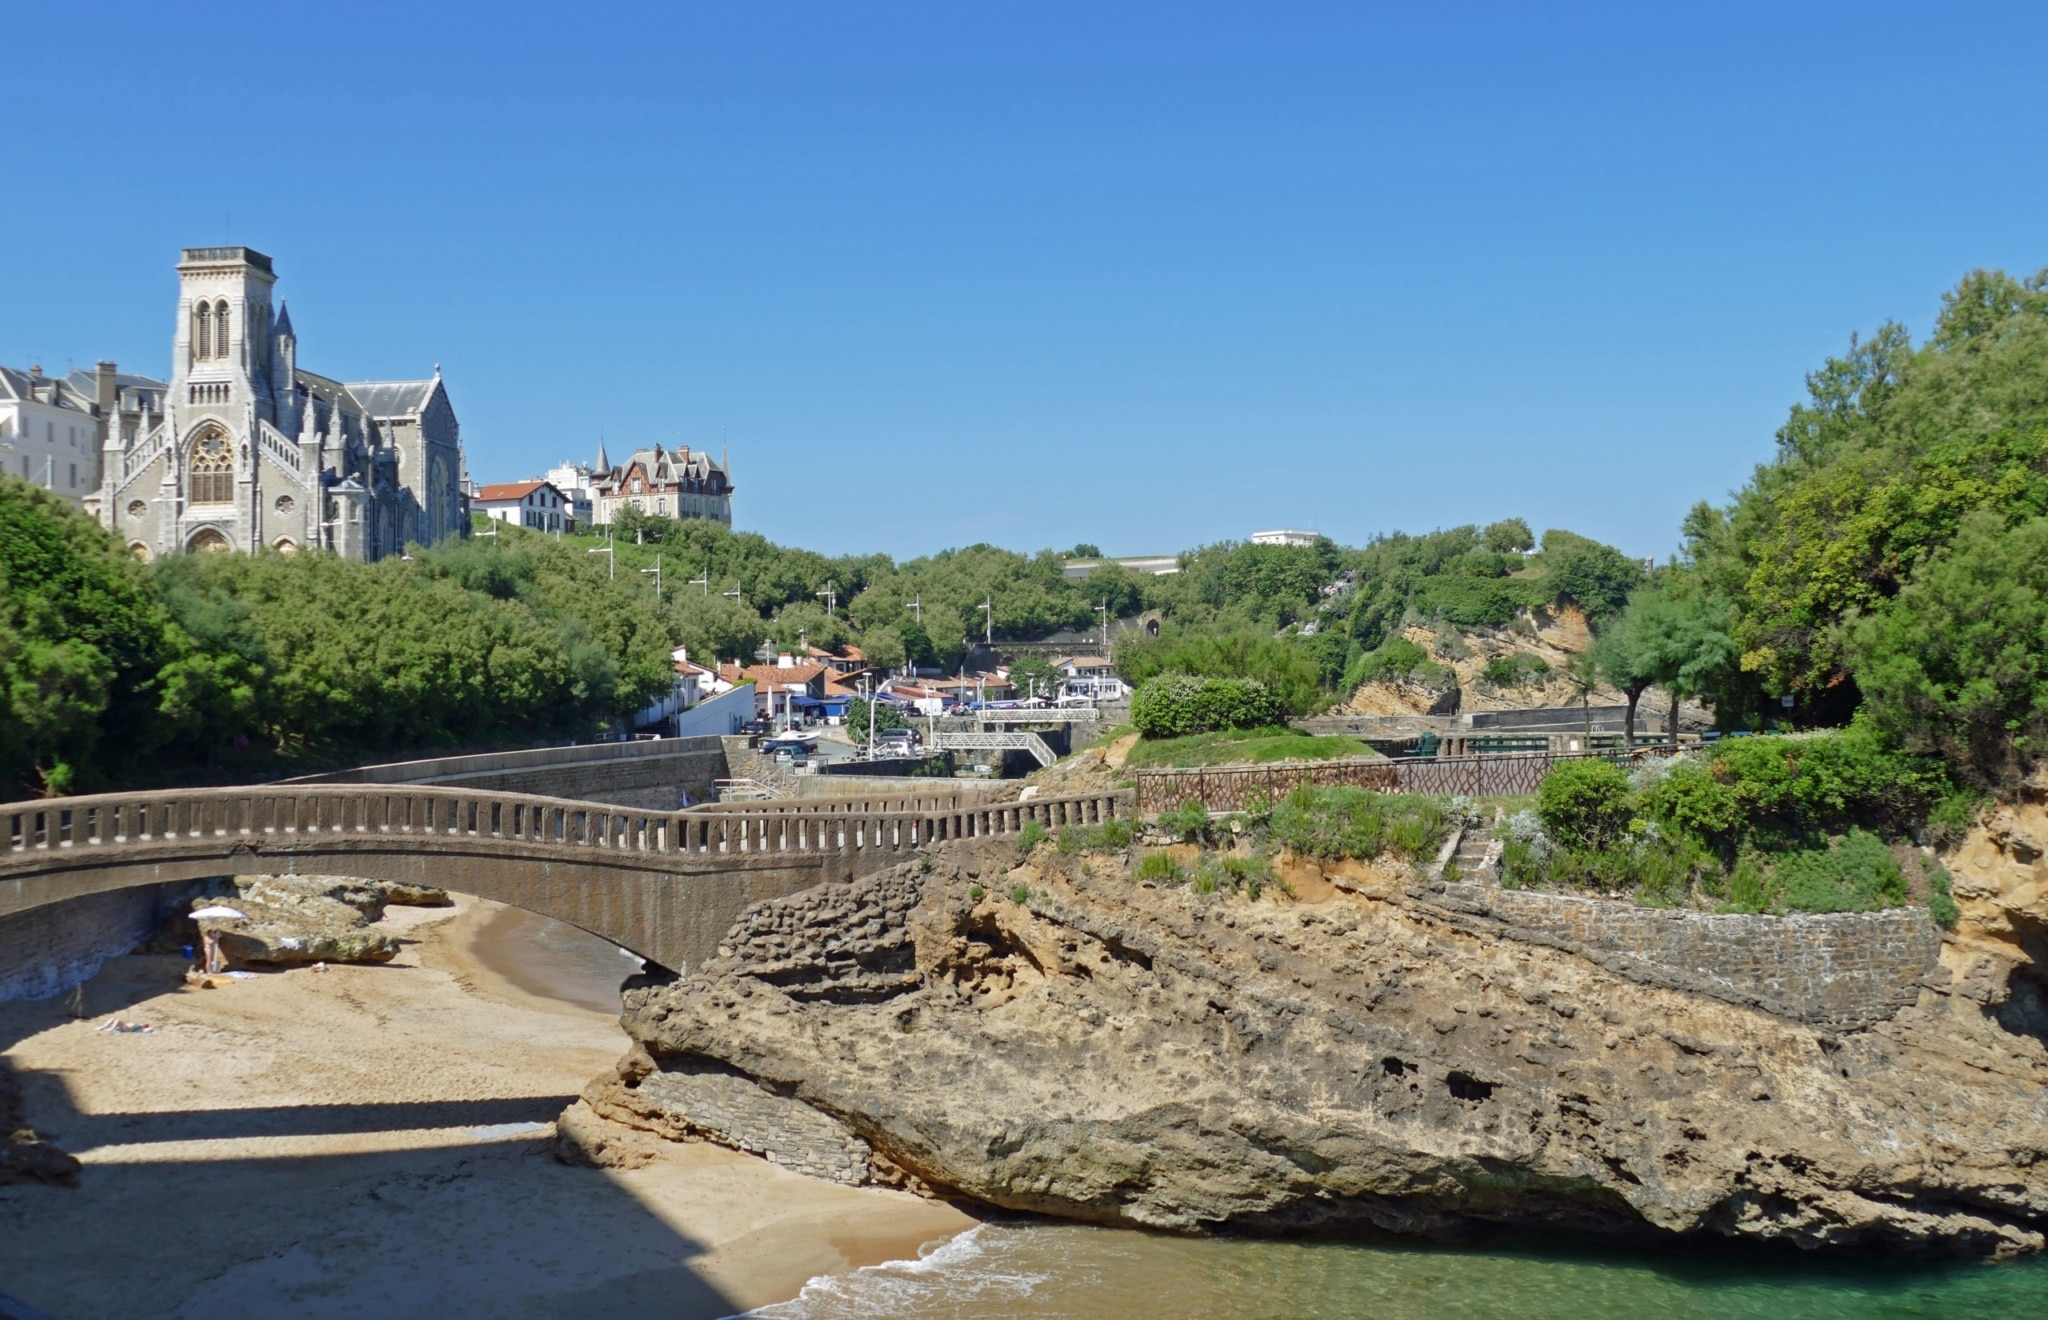 visite-guidee-paysbasque-Biarritz-Port-Pecheurs ©F.Perrot